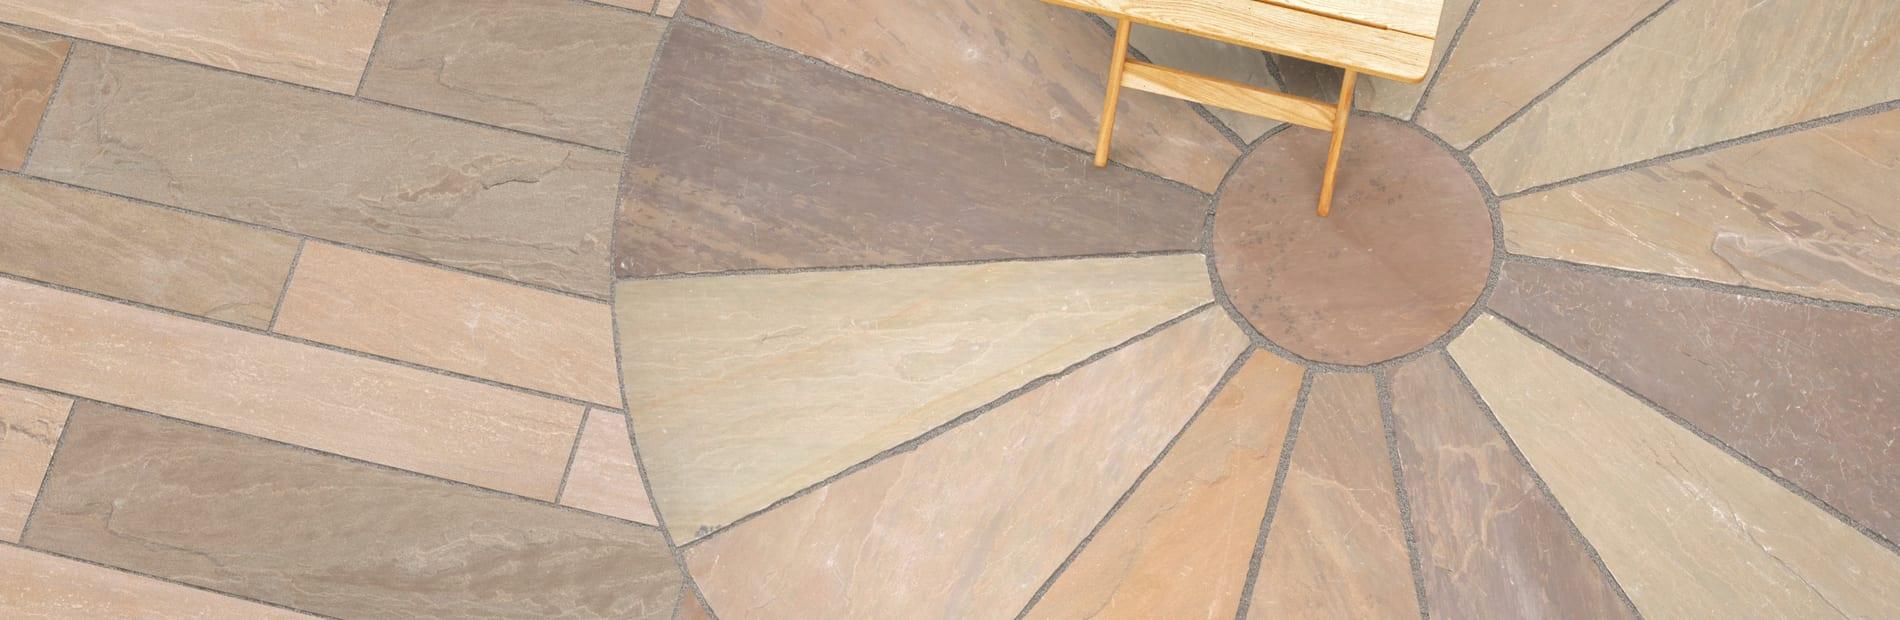 Fairstone Riven Harena Circle hero image